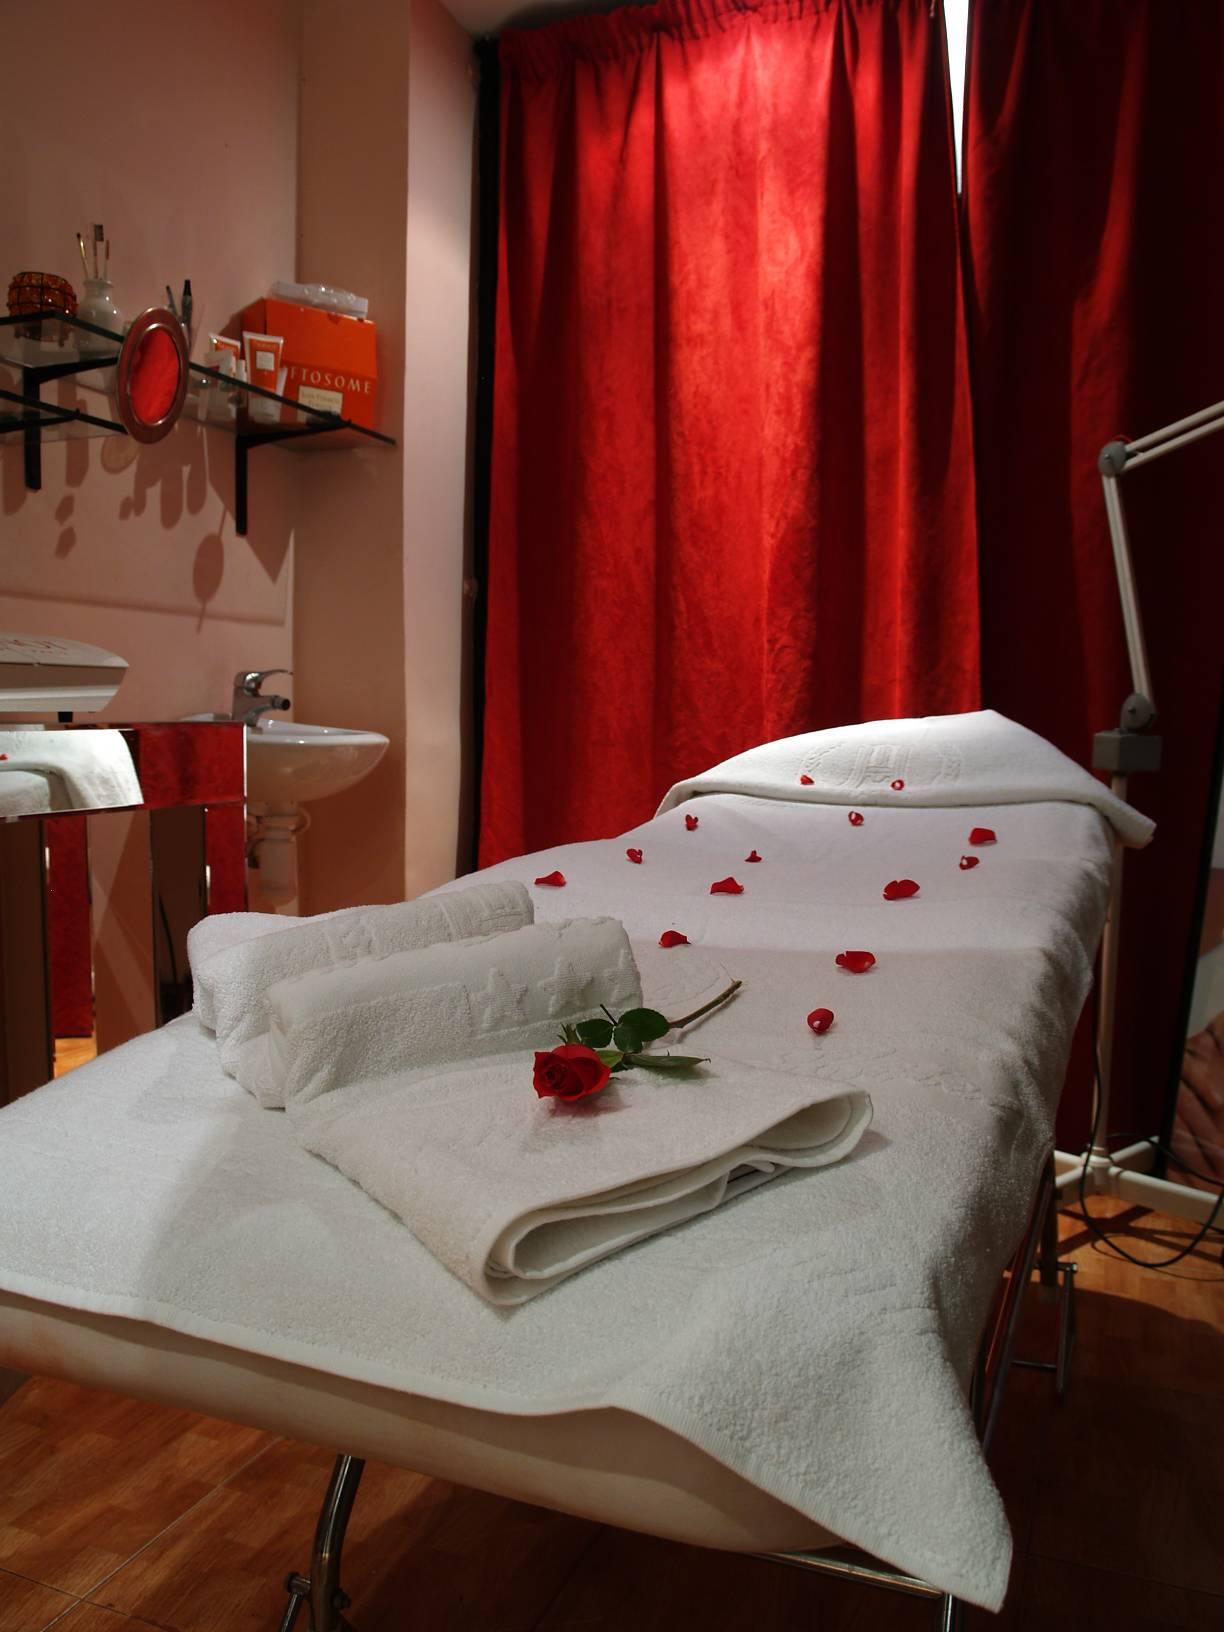 Objectif Zero Dechet Salle De Bain ~ offre deals hotels hotel imperial holiday marrakech